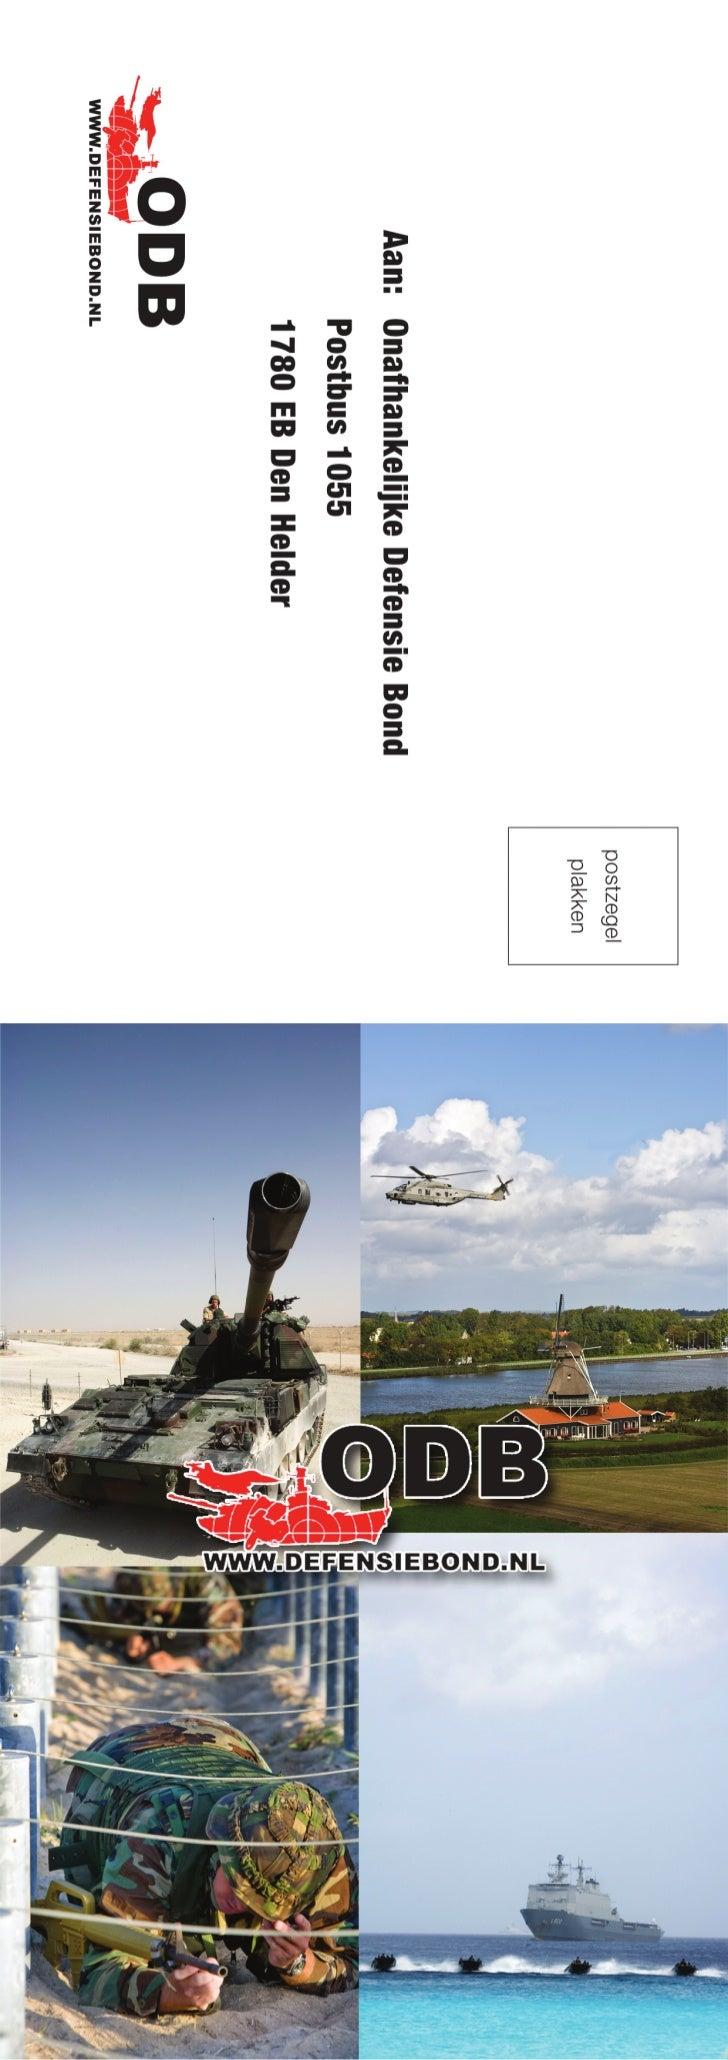 Aanmeldkaart Buitenkant 2012